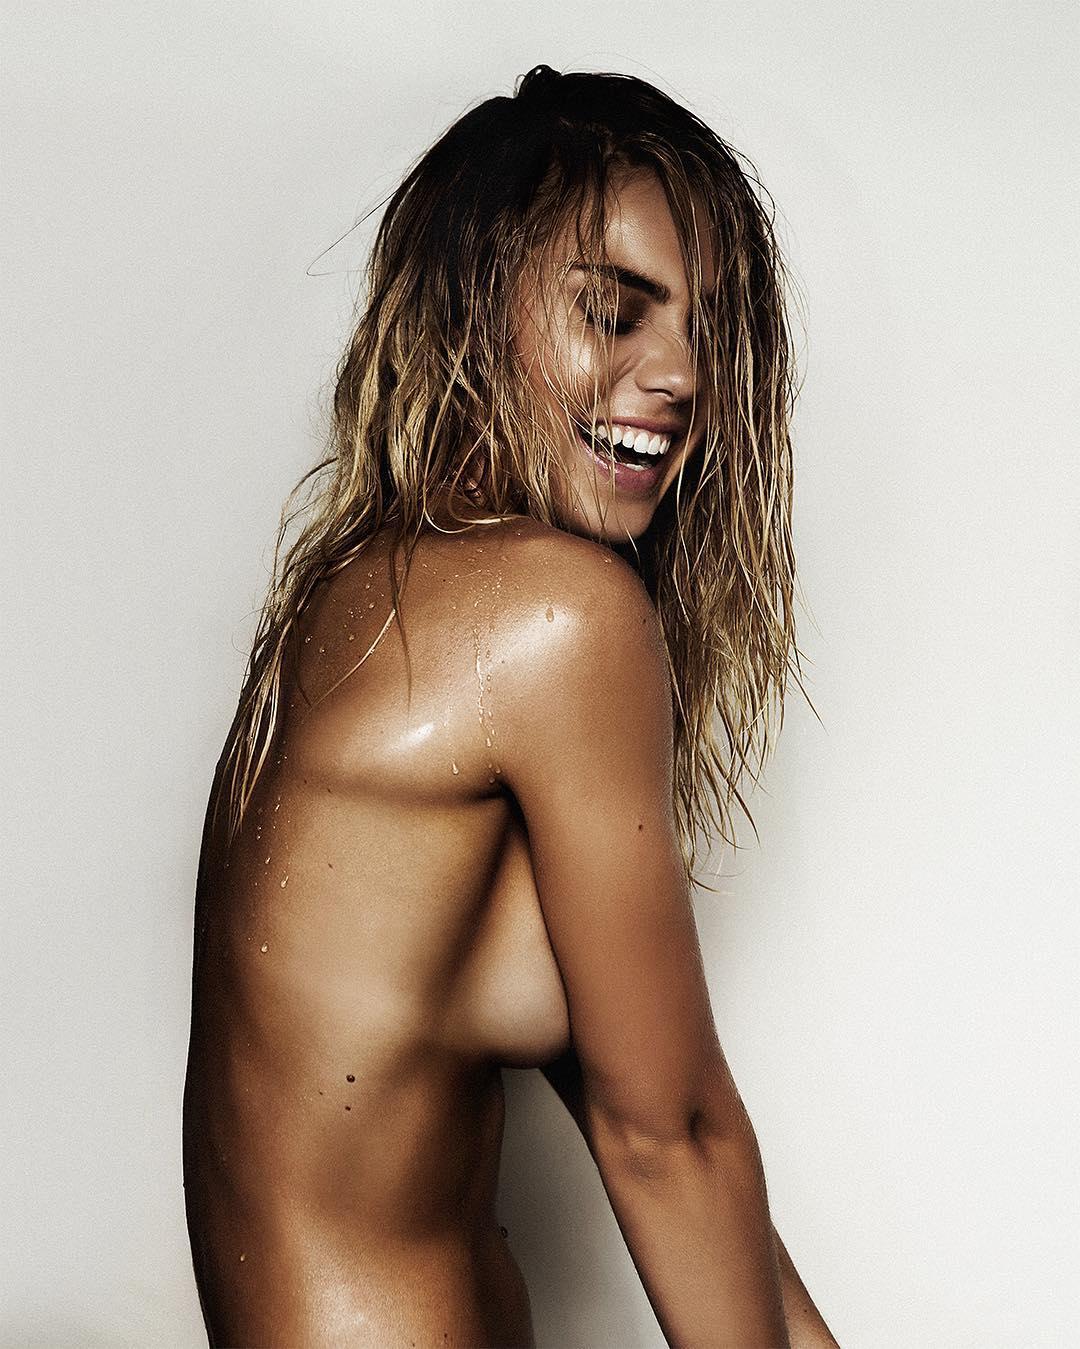 Natasha oakley butt,Sara underwood naked 9 Porno archive Lindsey Vonn Nude Photos Videos,Poll: Rosie Mac vs. Felicity Jones